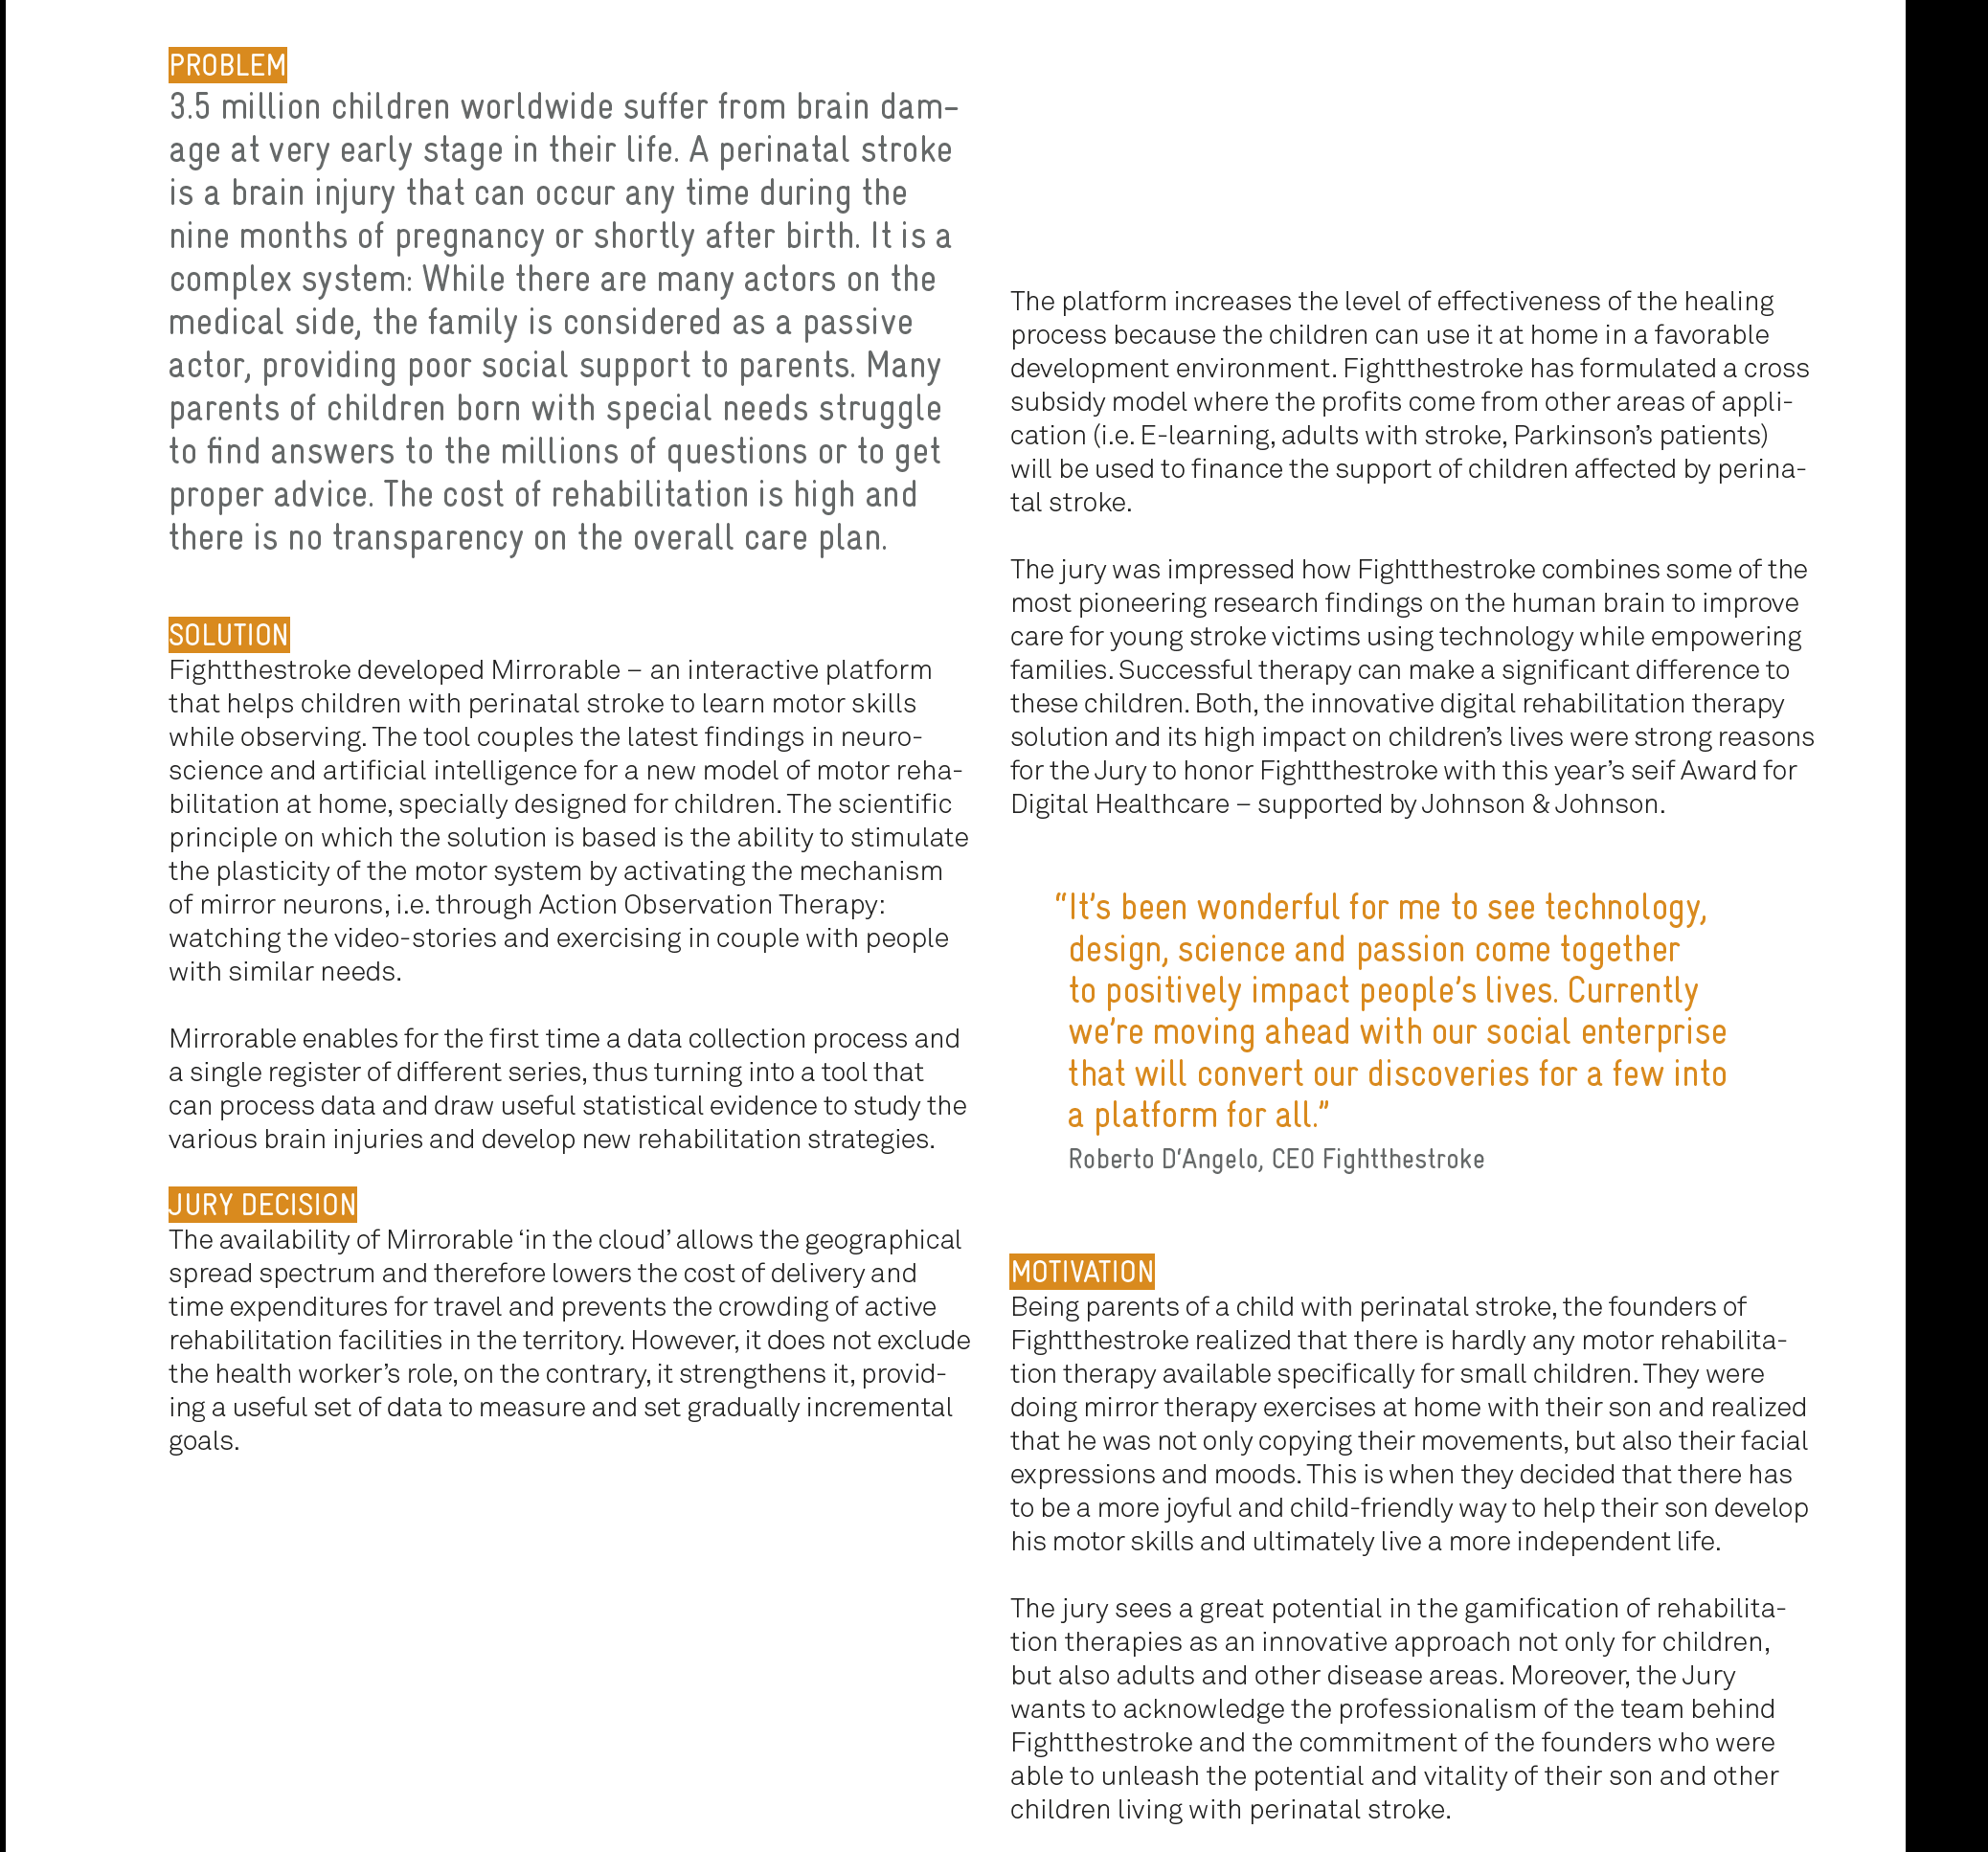 seifawards mirrorable.pdf - Adobe Acrobat Pro DC 2017-10-06 14.04.29.png